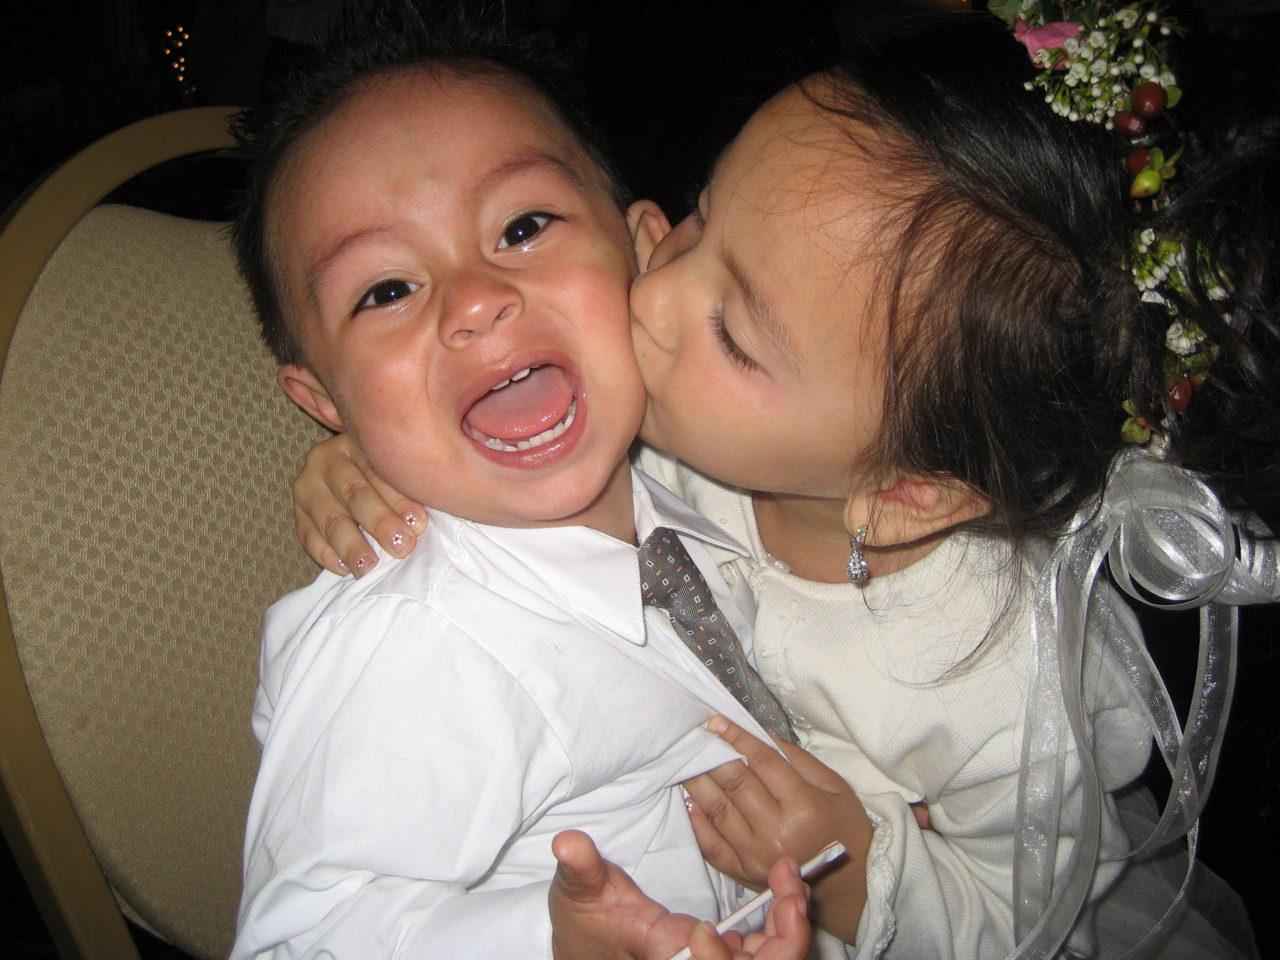 Cute baby girl and boy kissing little girl kissing little boy at wedding hot girls altavistaventures Images